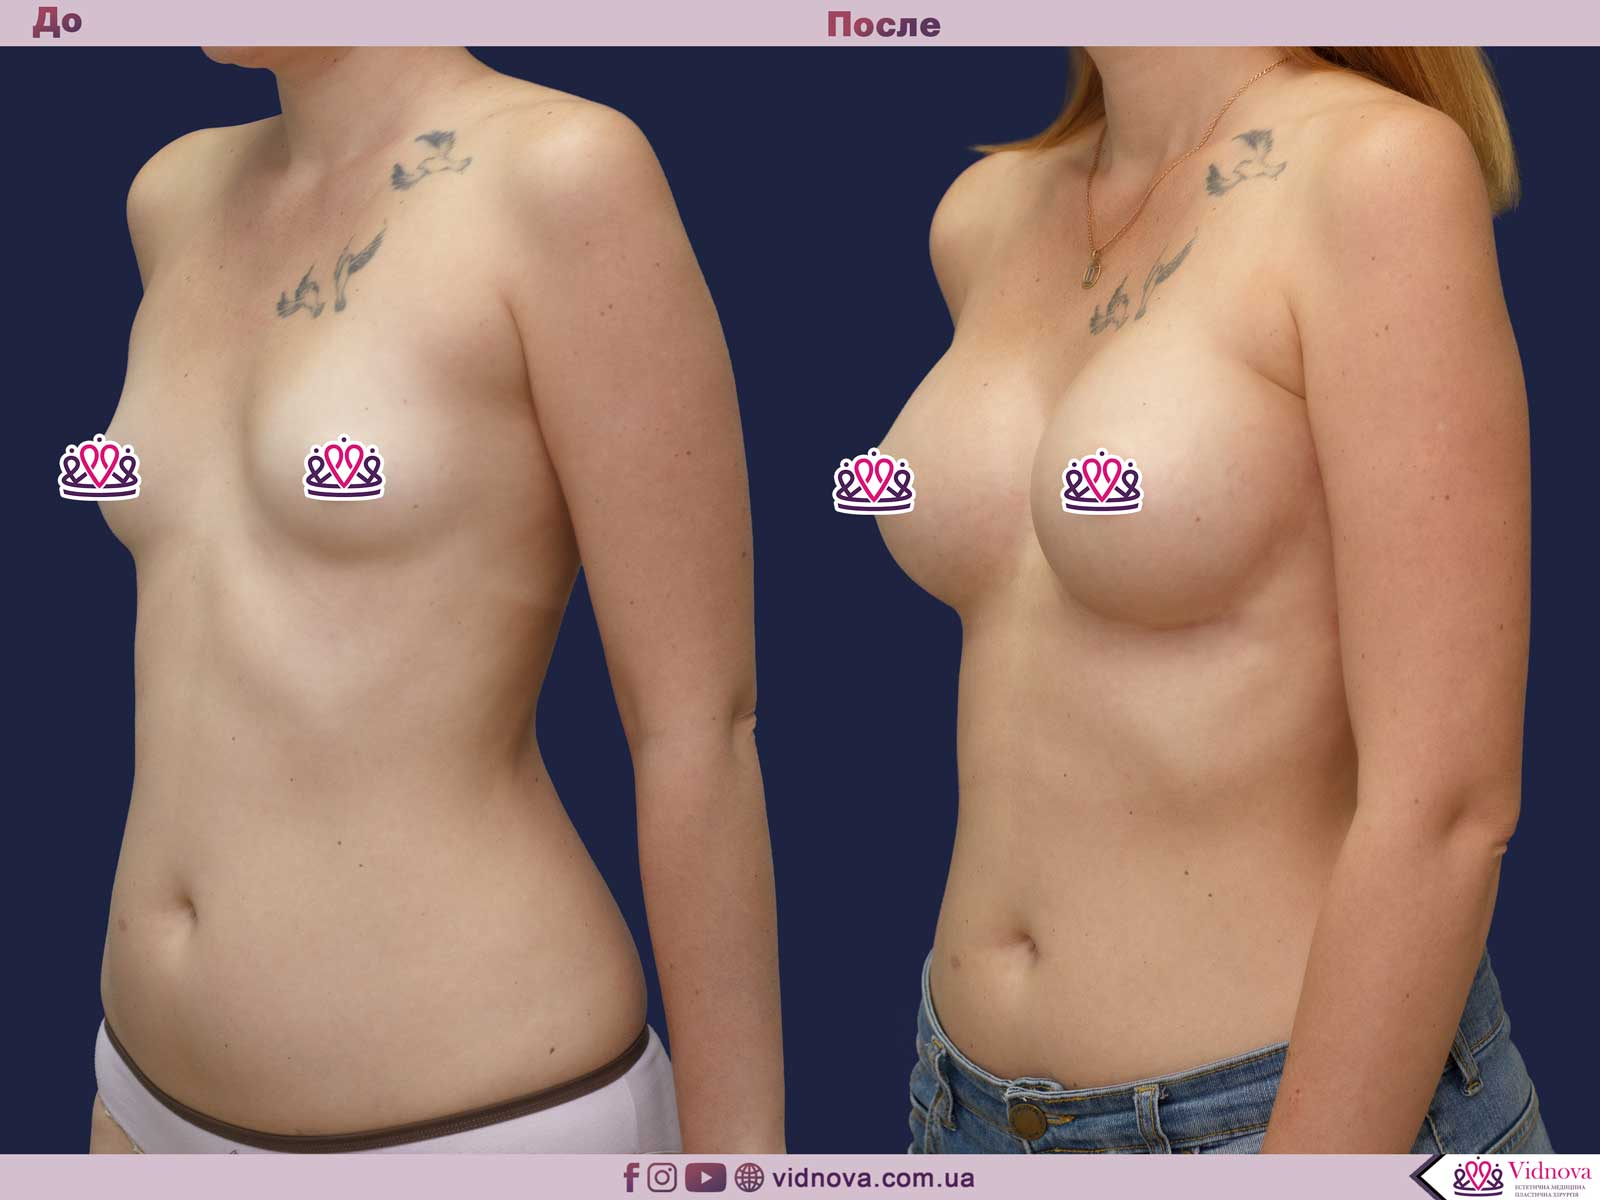 Увеличение груди: Фото ДО и ПОСЛЕ - Пример №55-2 - Клиника Vidnova